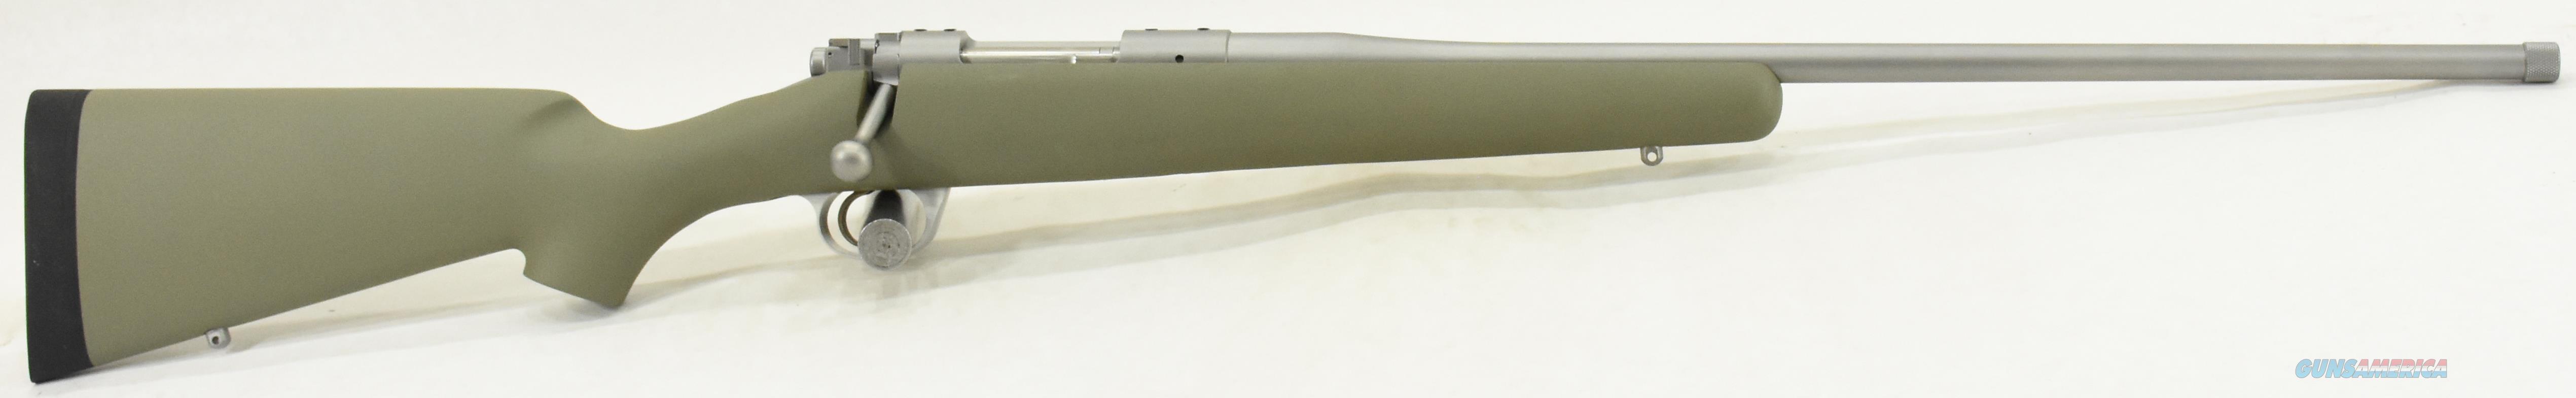 84M Montana Green 22-250Rem 22In TB 3000800  Guns > Rifles > Kimber of America Rifles